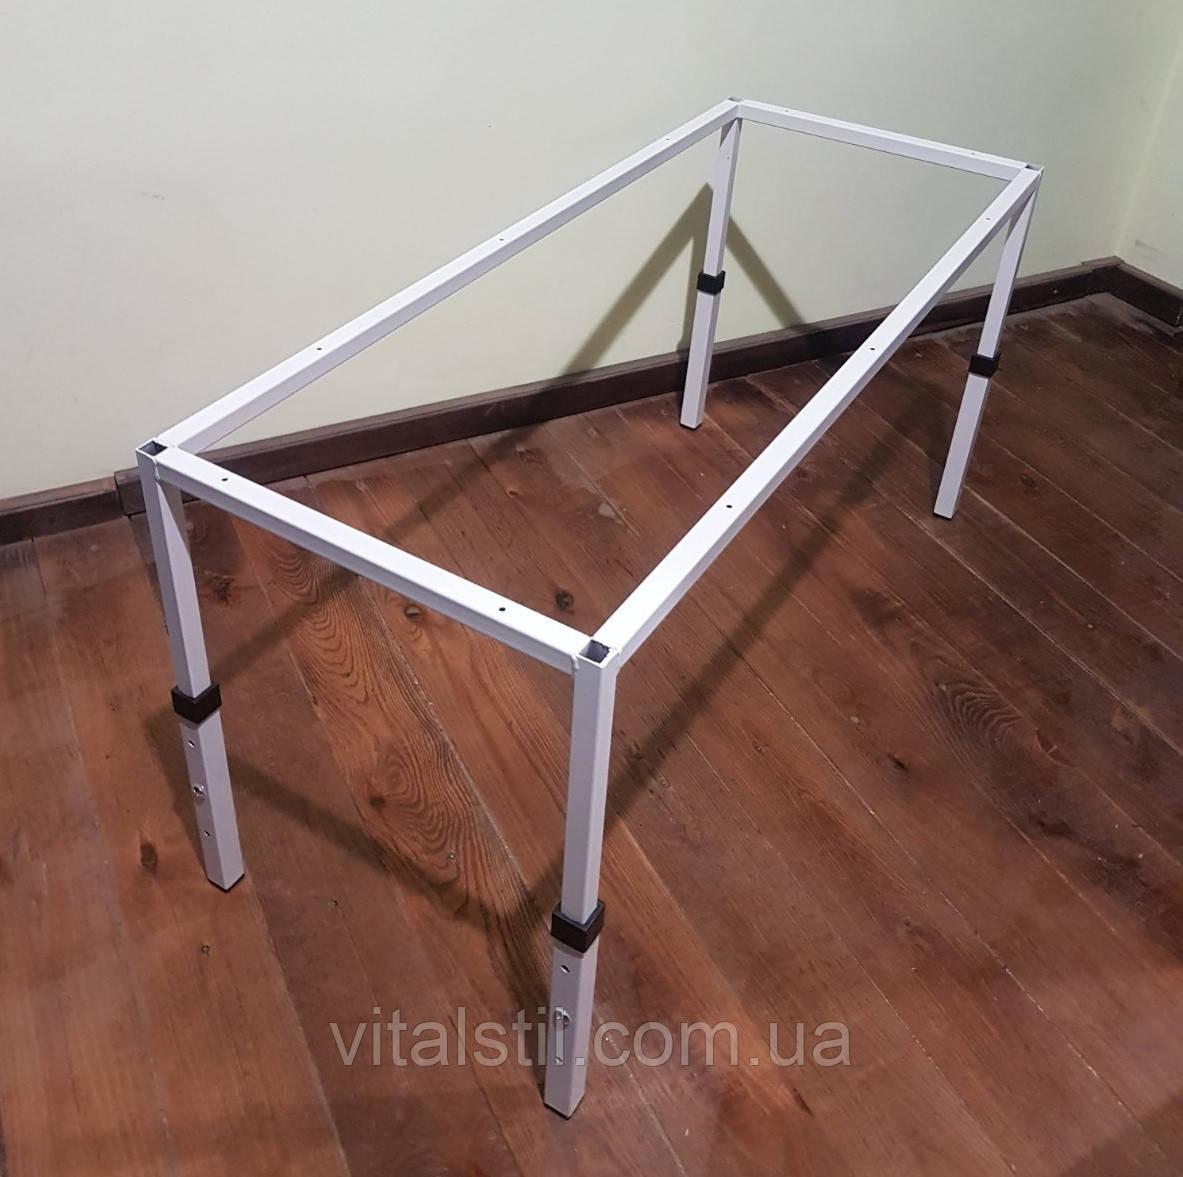 Каркас шестигранного регульованого столу